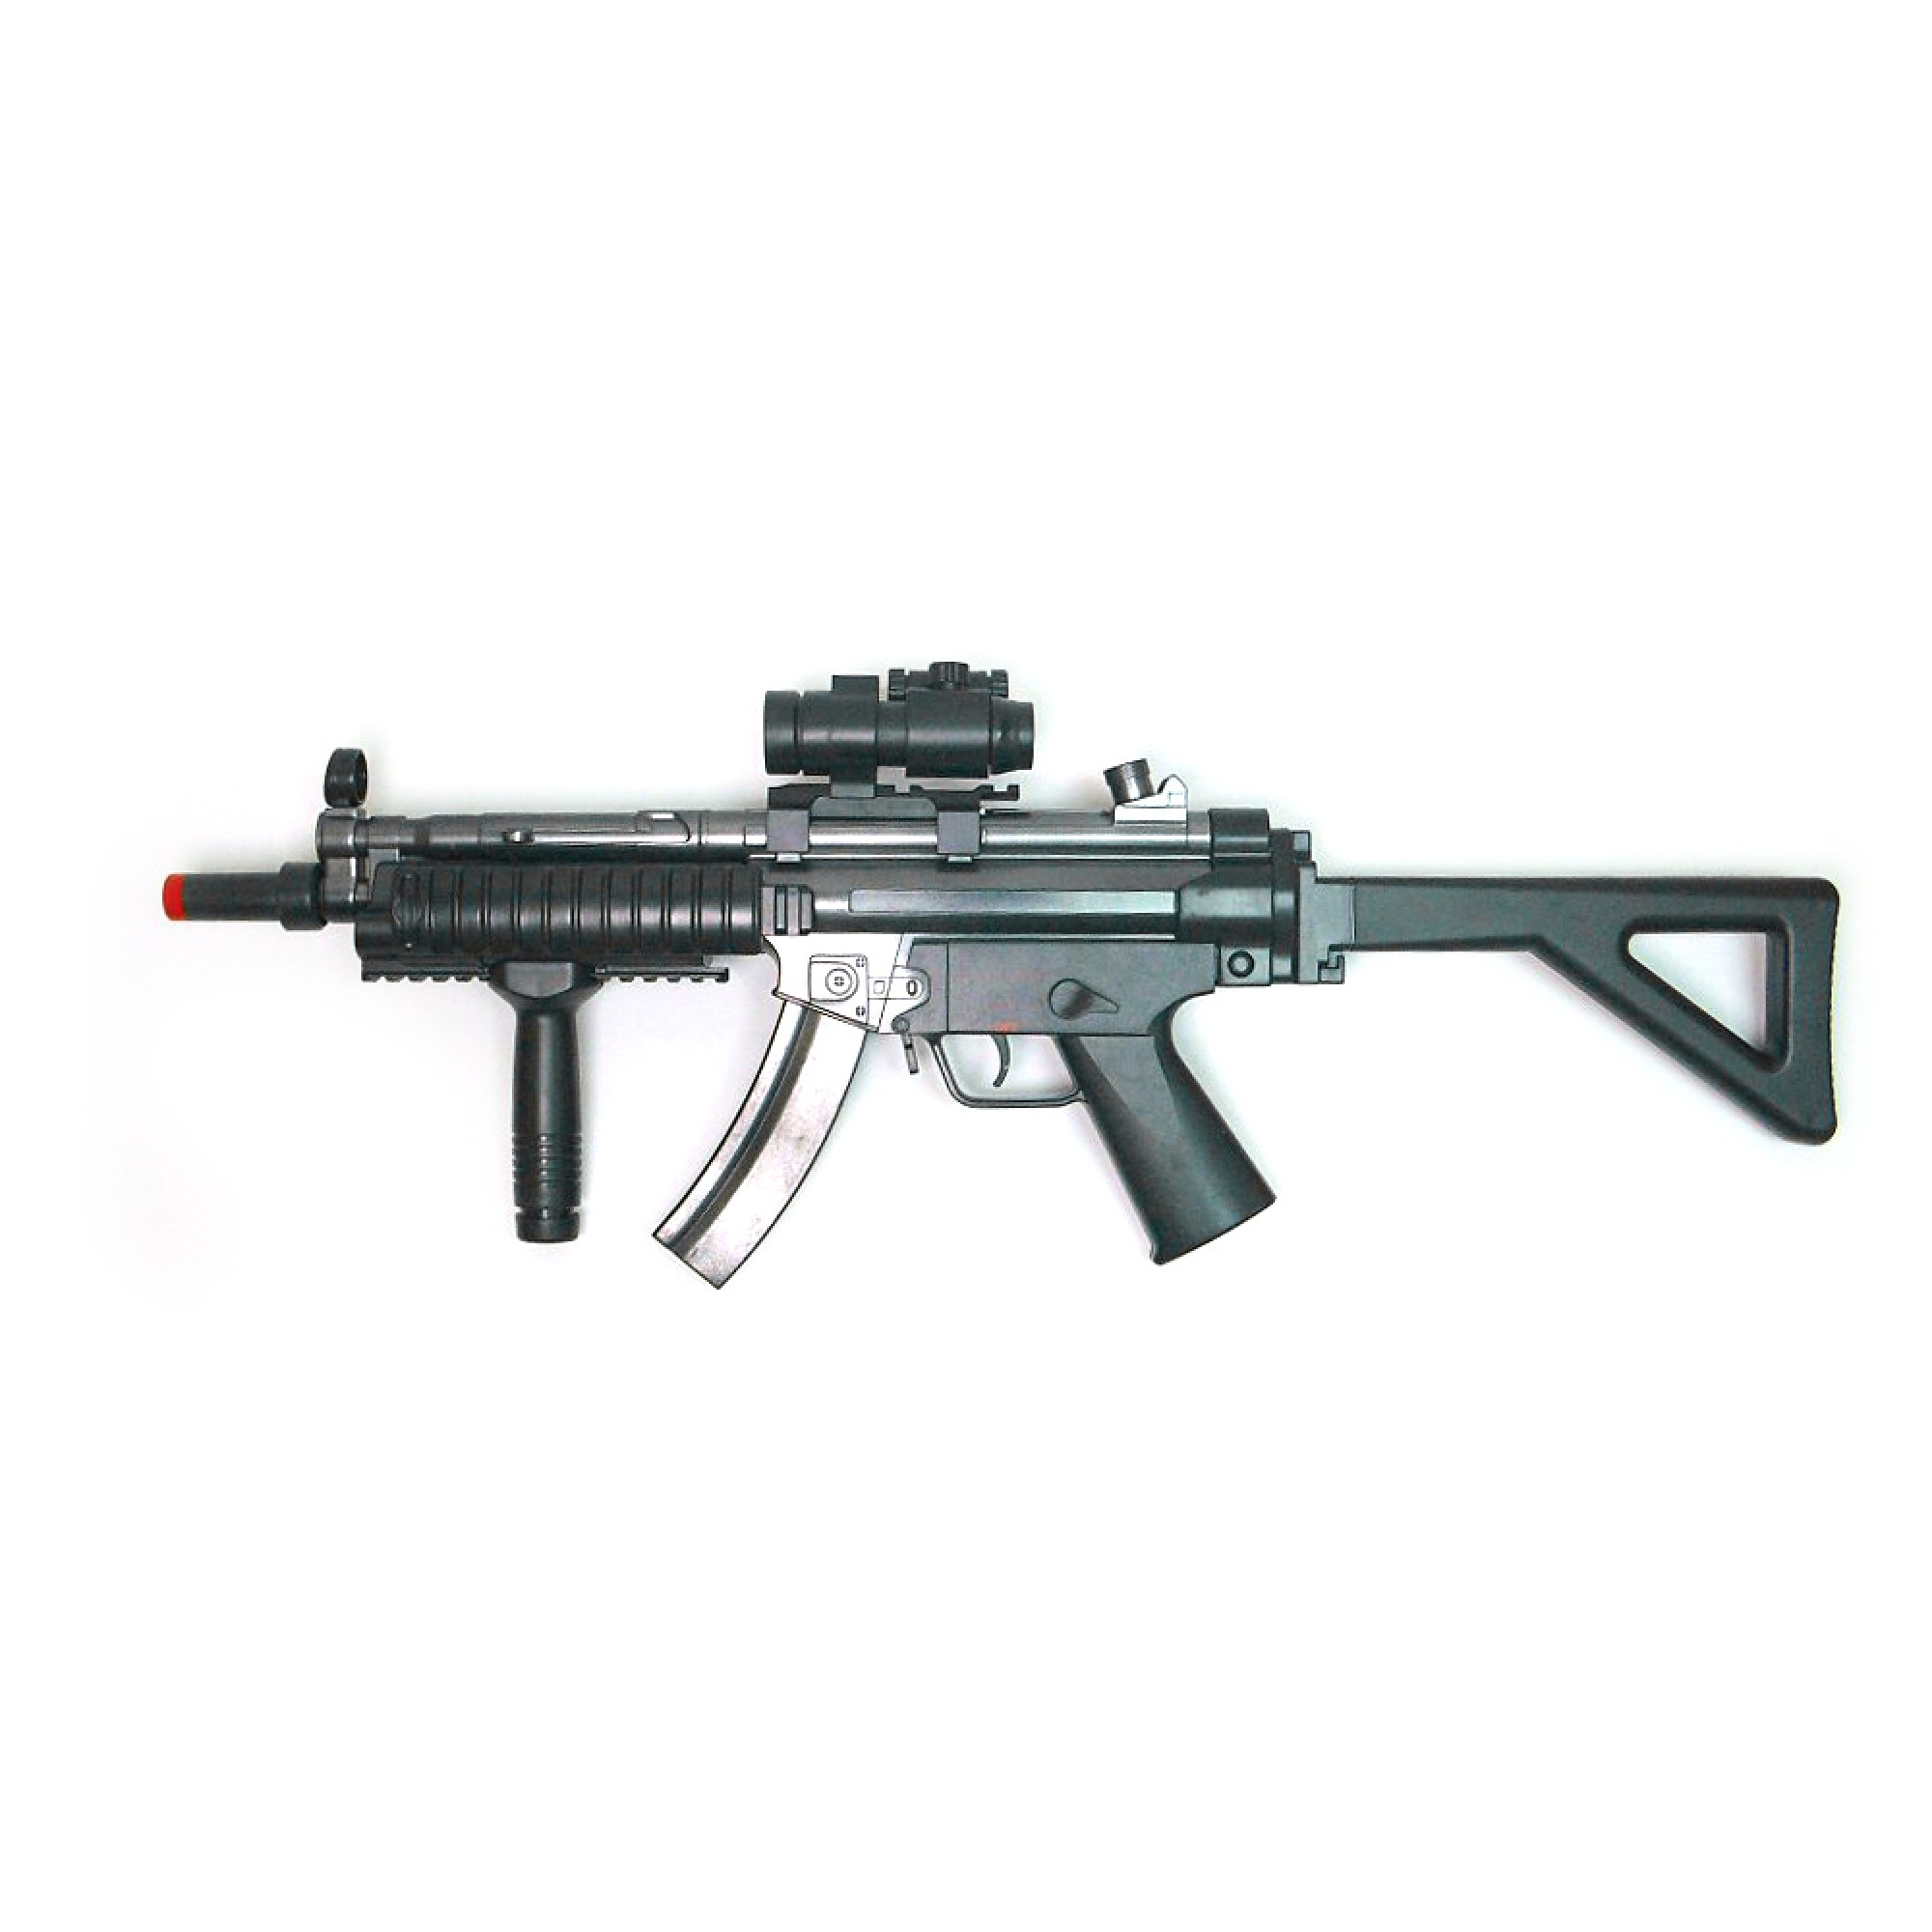 MP5 RAS W/Light, Sound, Vibration & Viewer